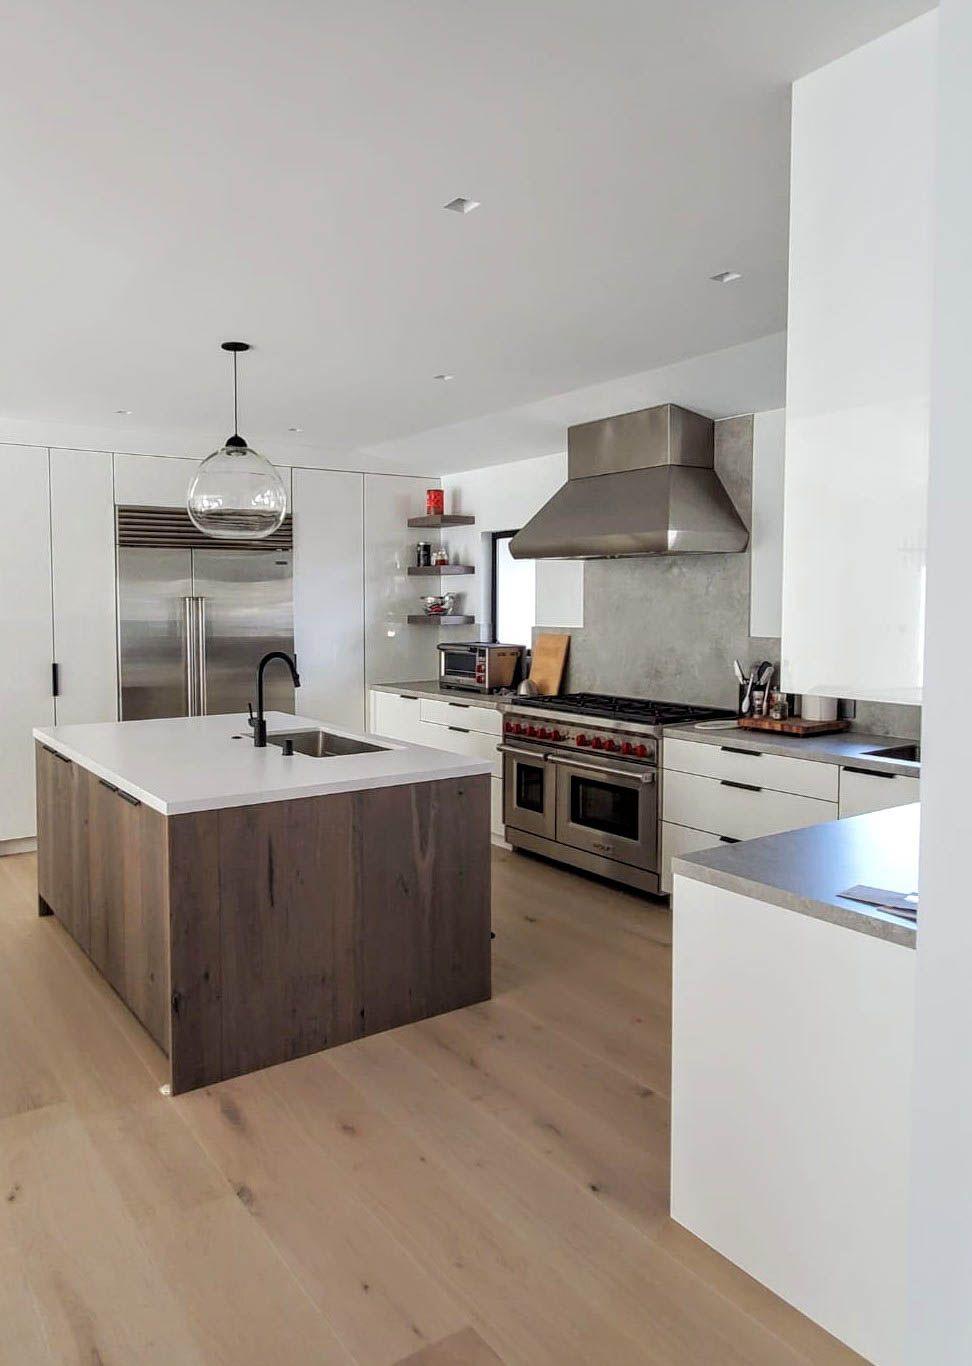 Kitchen Cabinet Design Ideas 2021 Novocom Top